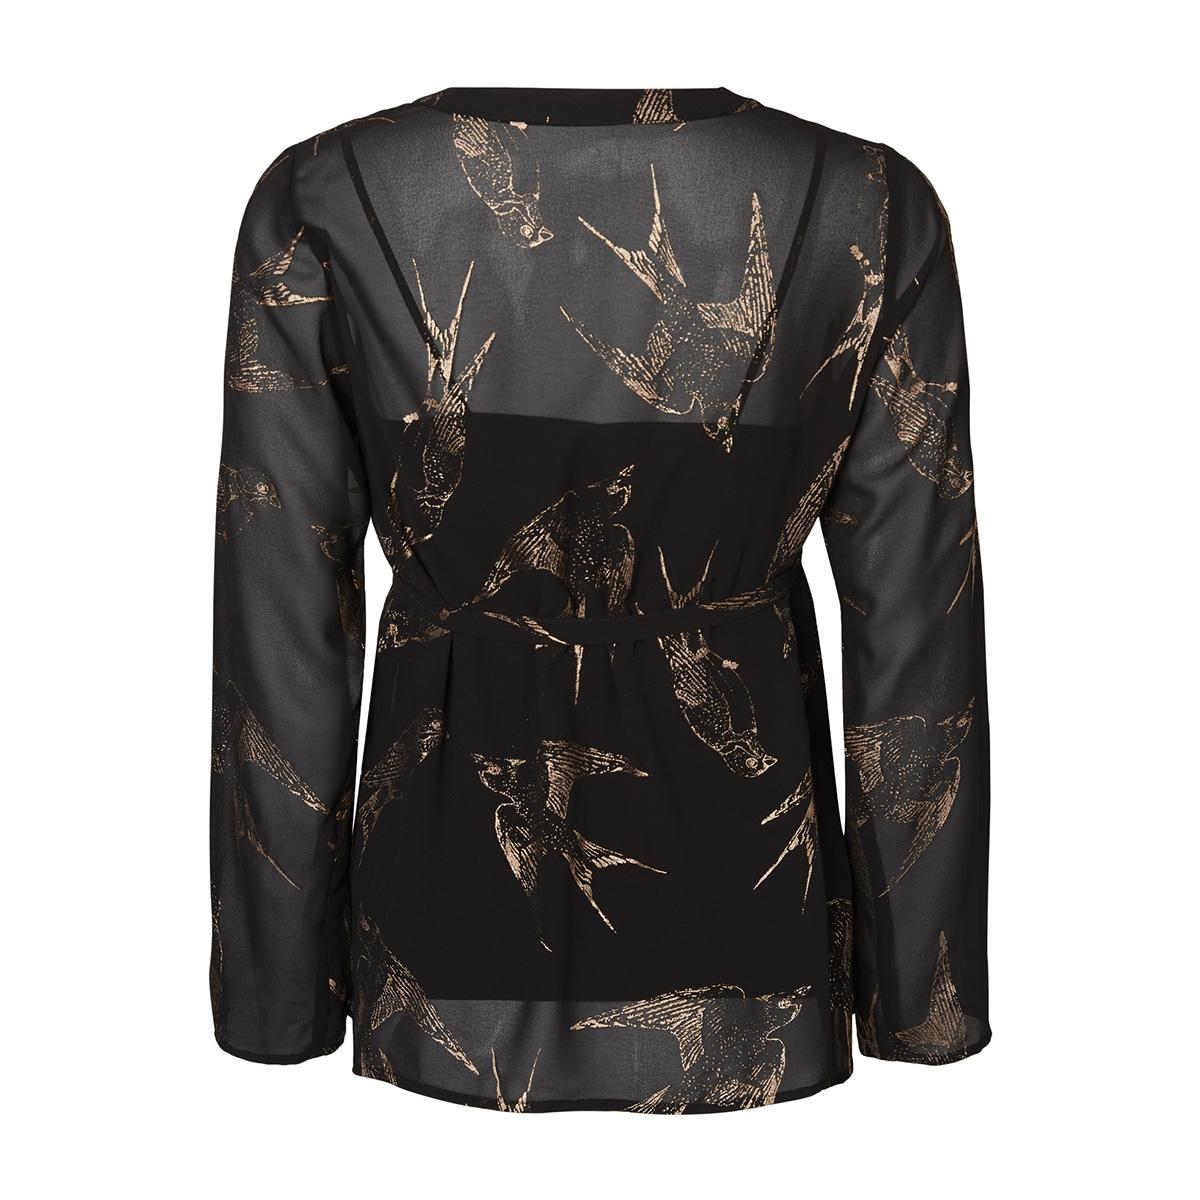 mlbird l/s woven top 20007812 mama-licious positie blouse black/bronze foi